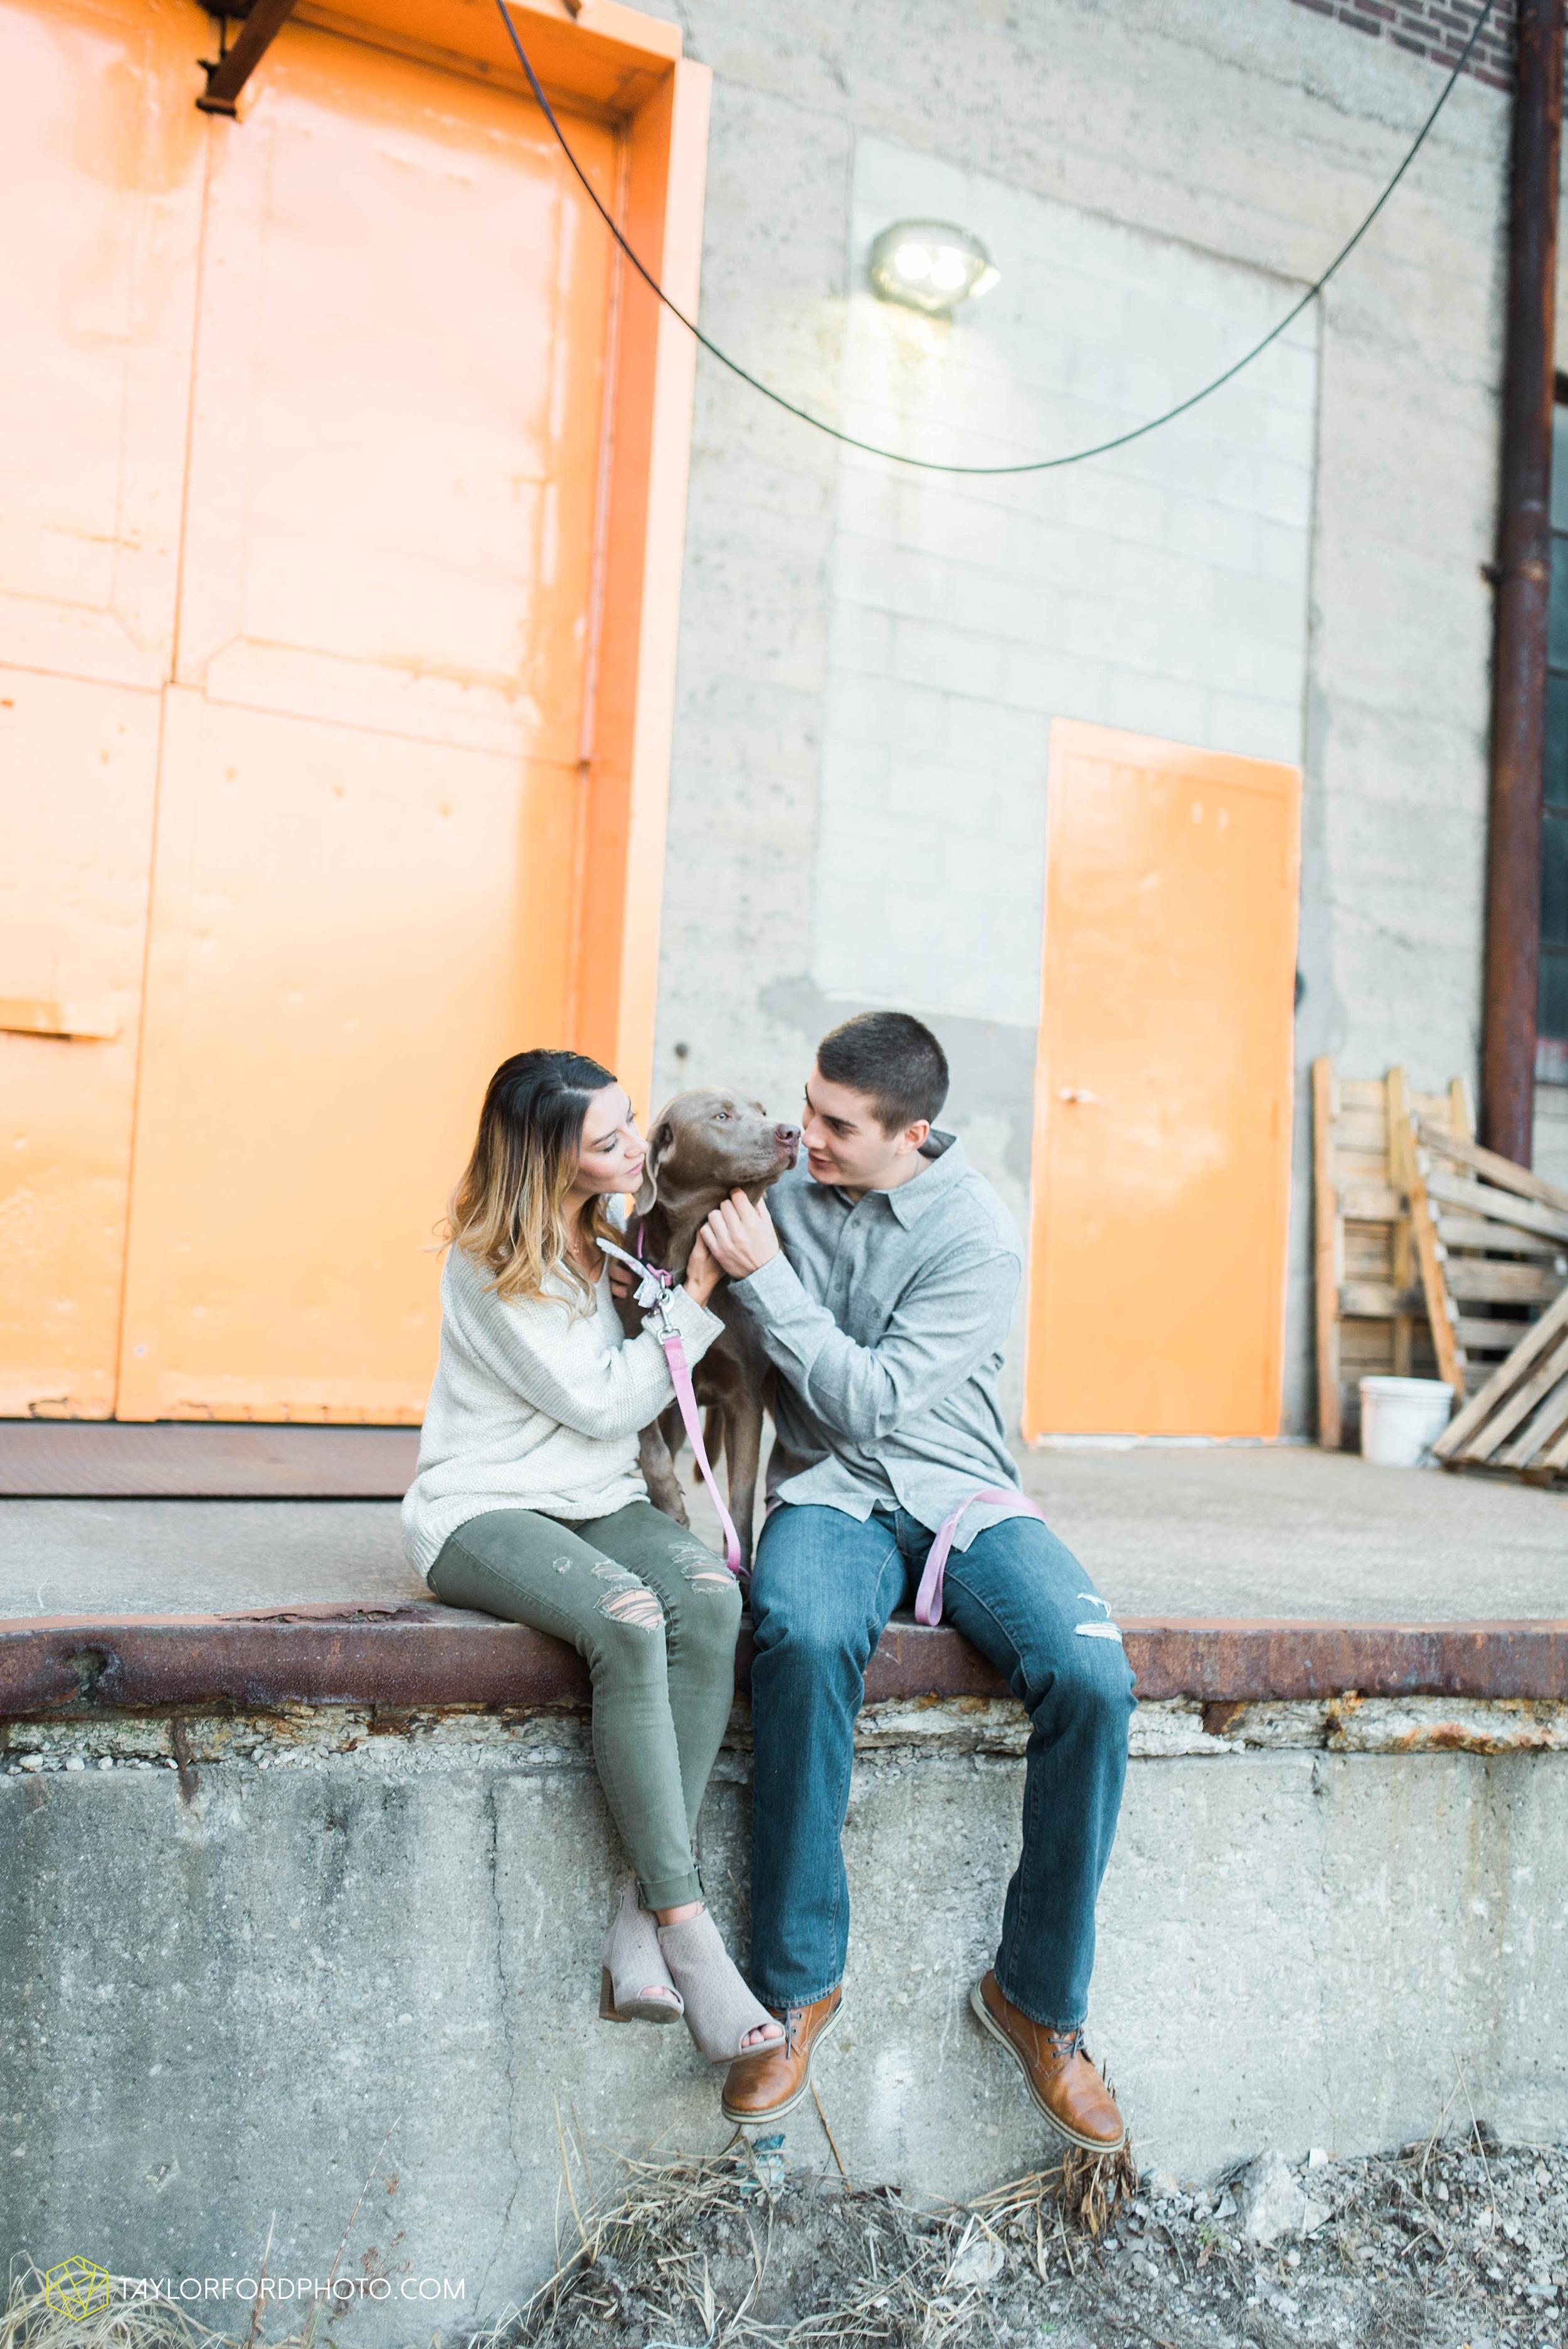 toledo-ohio-engagement-wedding-photographer-Taylor-Ford-Photography-oaks-openings-toledo-metro_3684.jpg